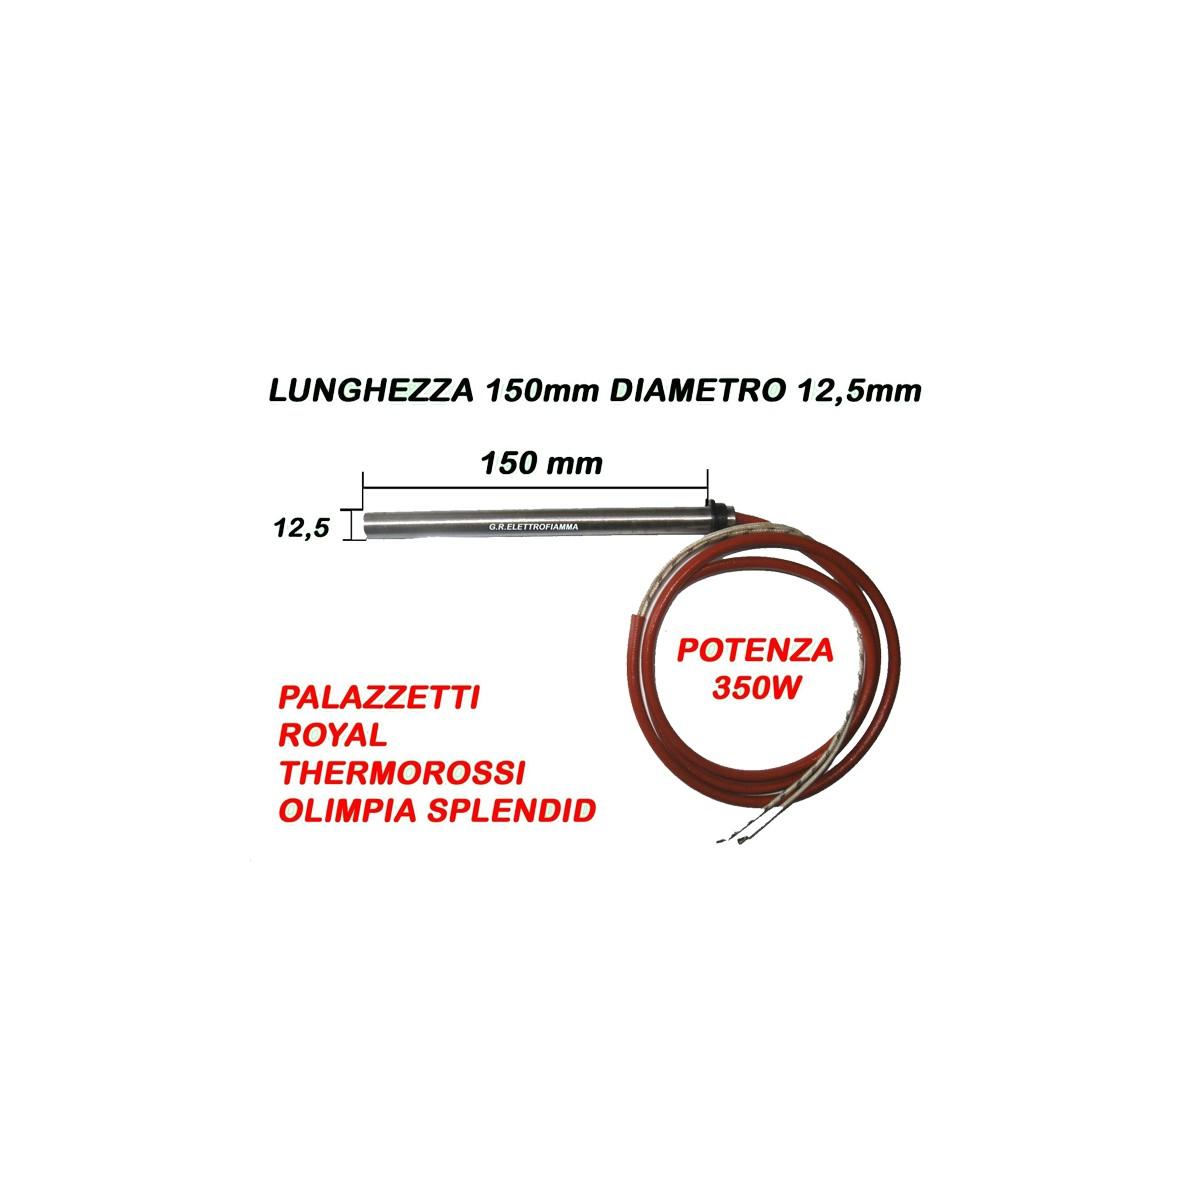 CANDELETTA STUFA PELLET 12,5x150 350W PALAZZETTI THERMOROSSI ECOTHERM 1000 3000 3001